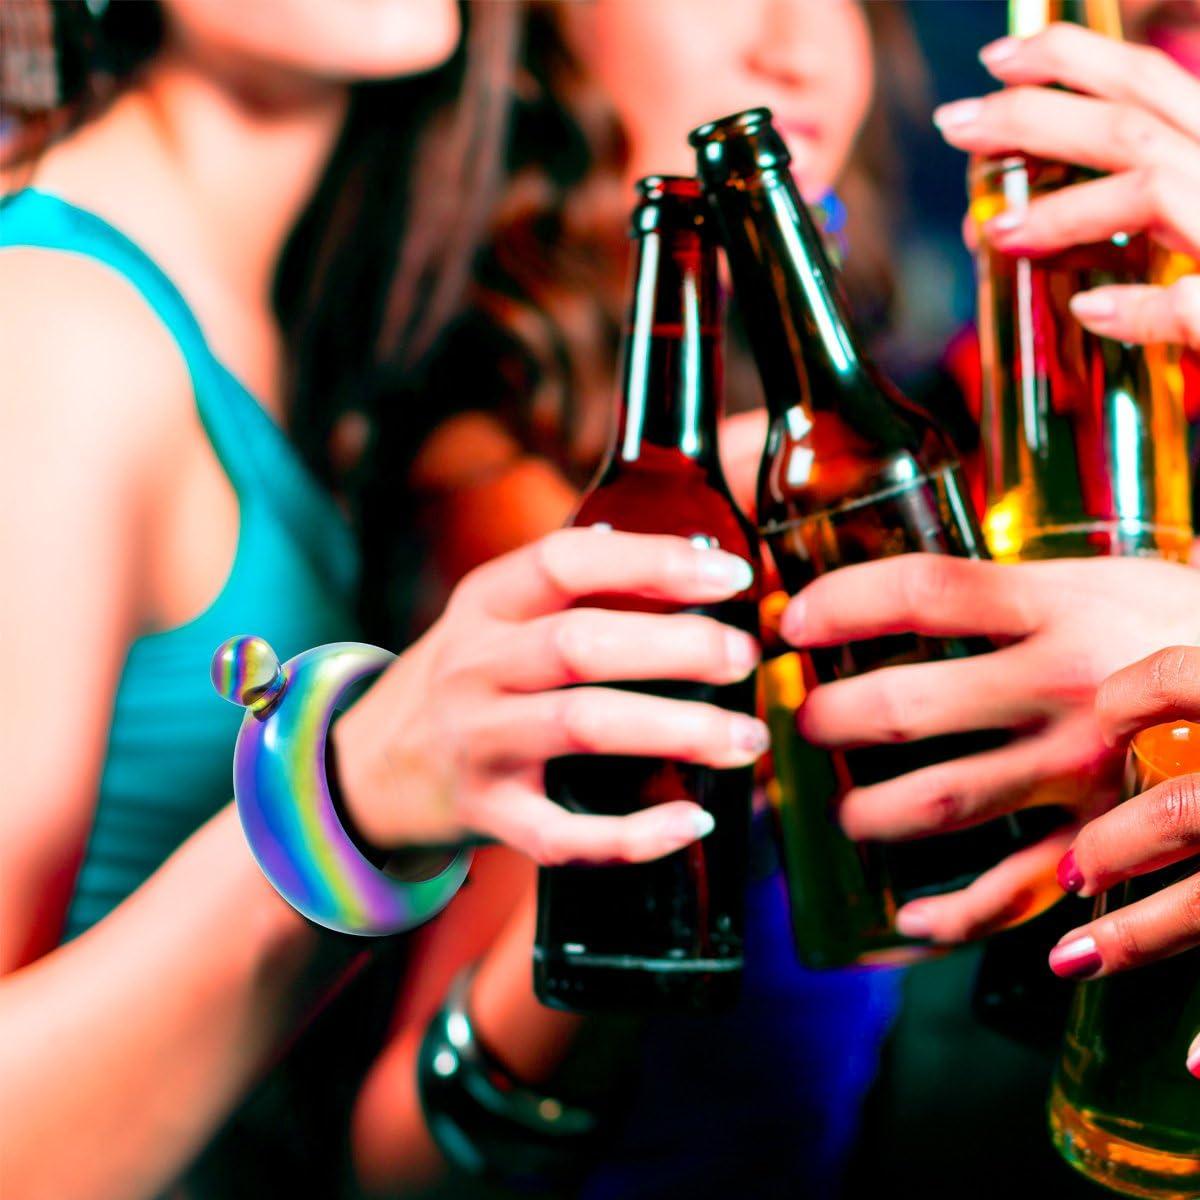 Stainless Steel Hidden Liquor Alcohol Cute Sneak Hip Flasks with Funnel Ajaa Wine Jewelry for Women Rainbow Flask Bracelet Bangle